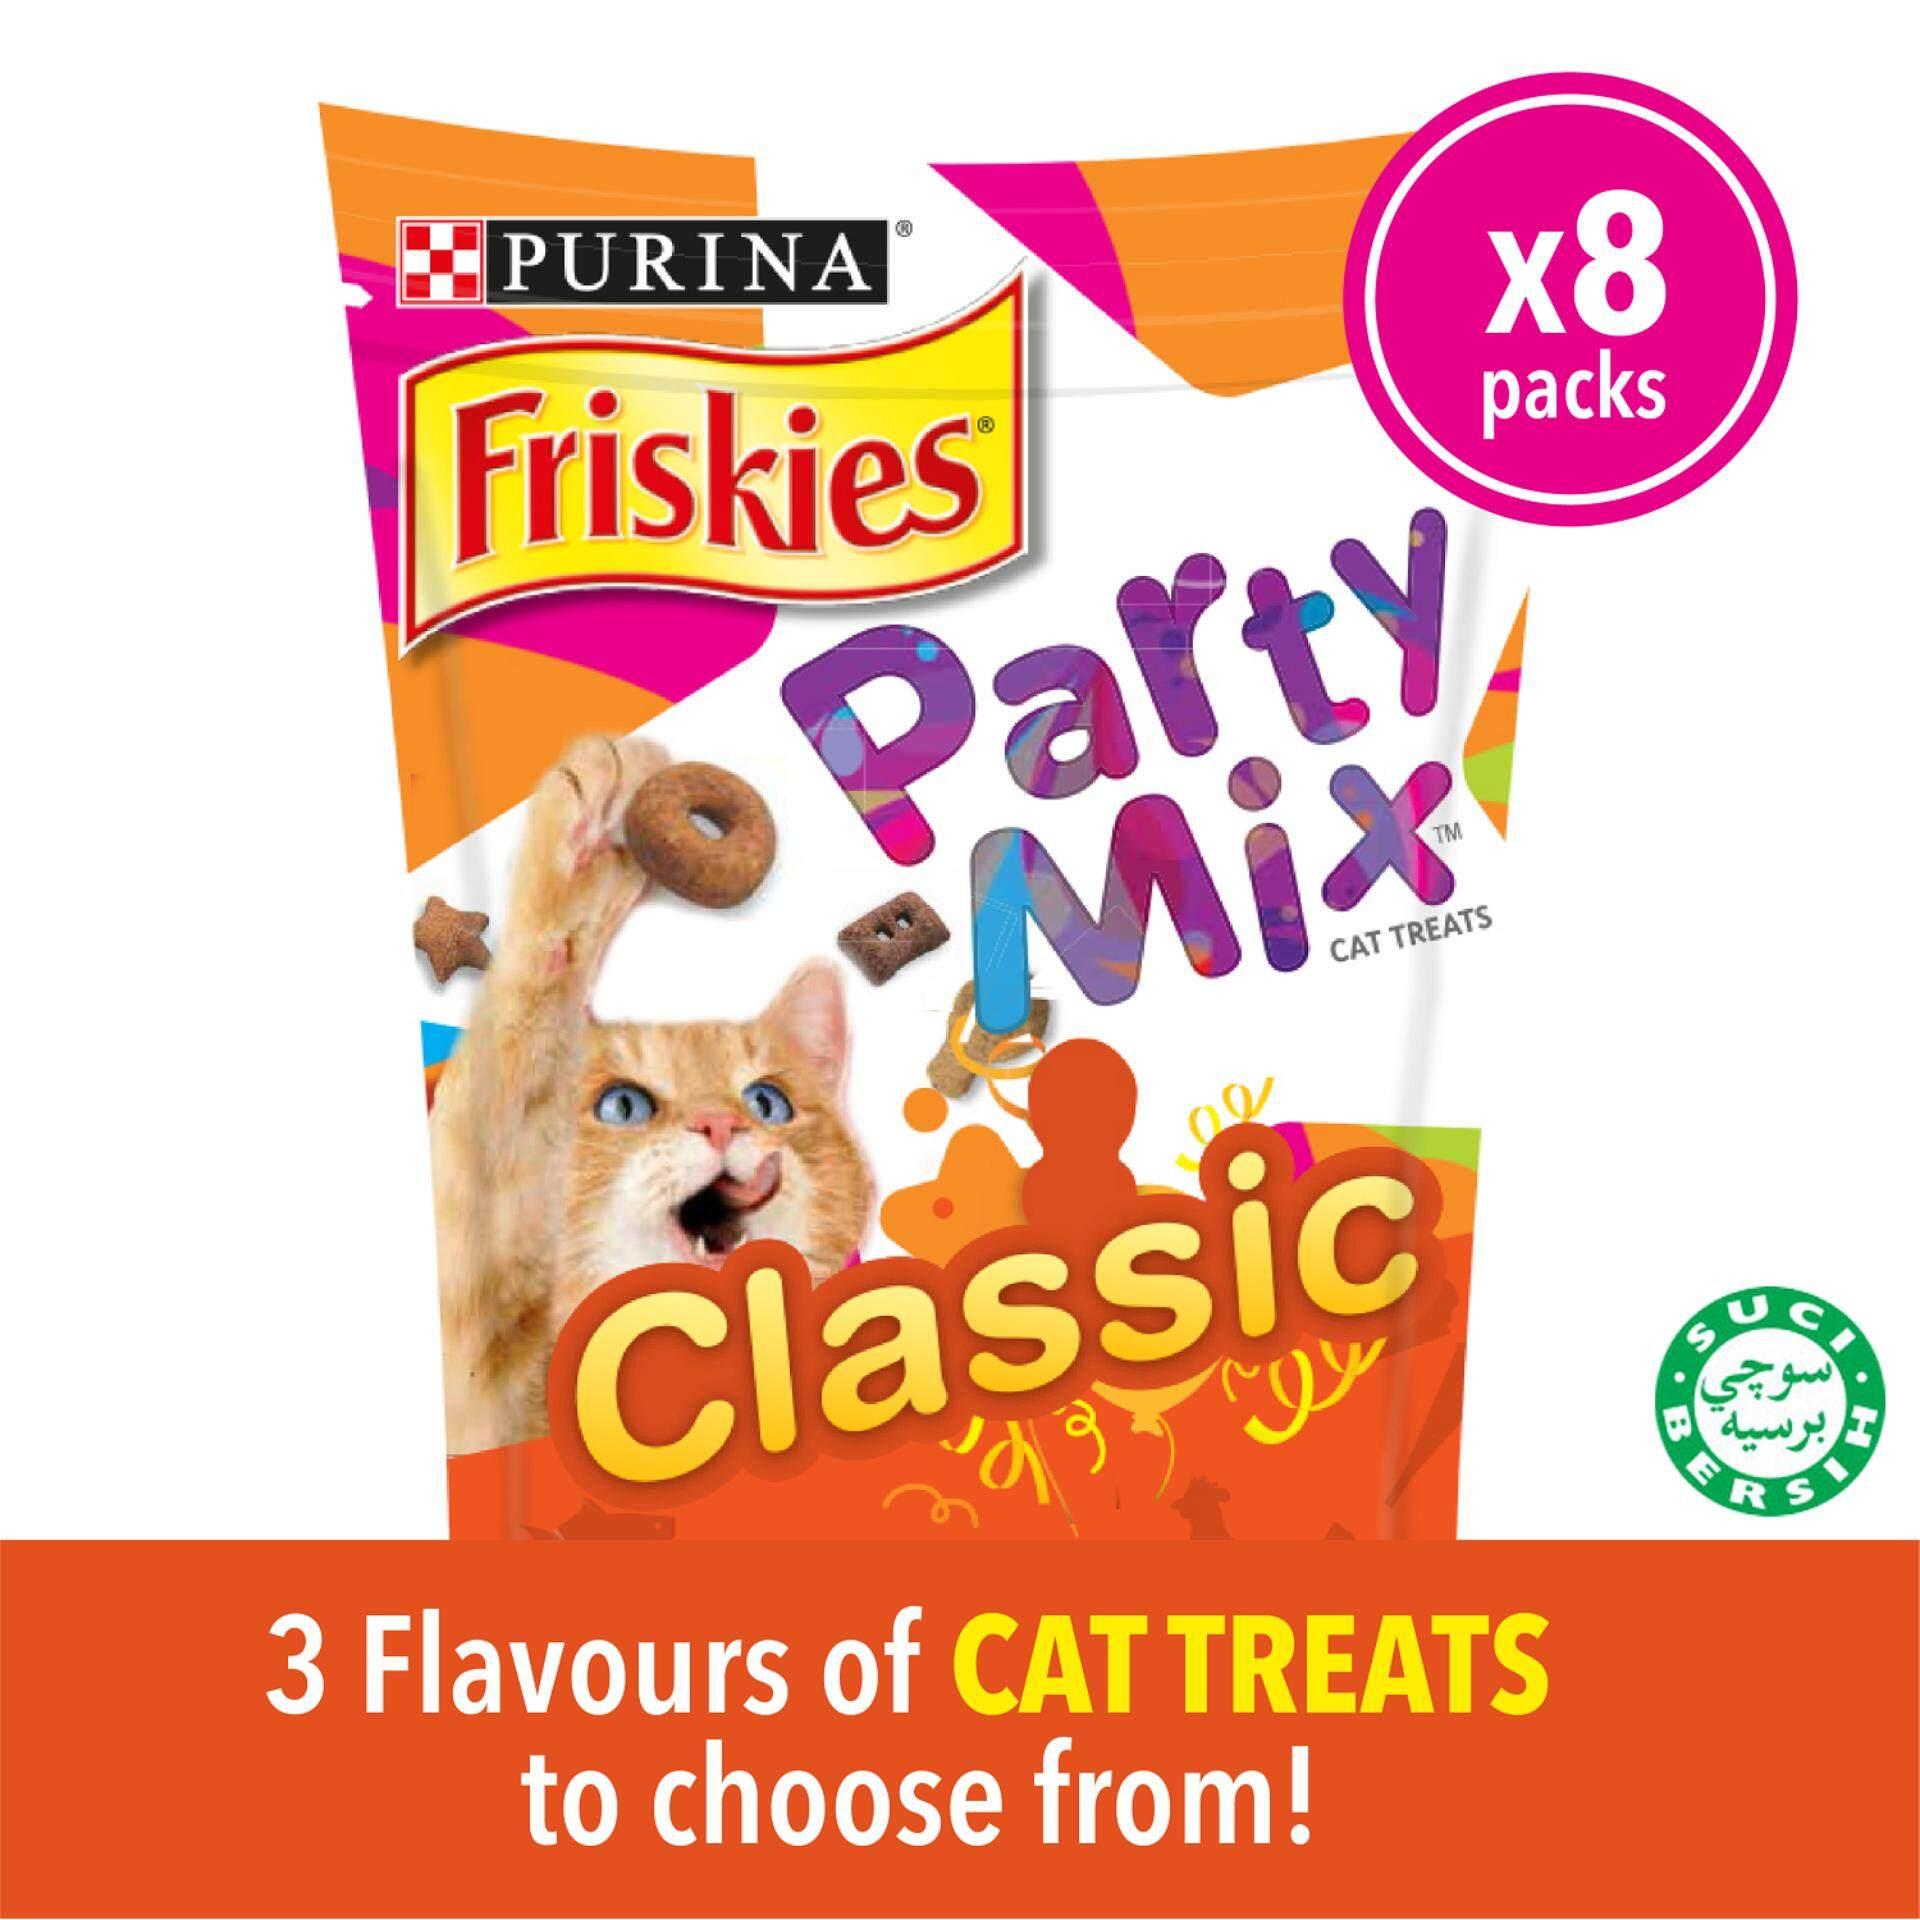 FRISKIES Party Mix Original Flavours Dry Cat Treats pack (8 x 60g) - Pet Food/ Dry Food/ Cat Food/ Makanan Kucing